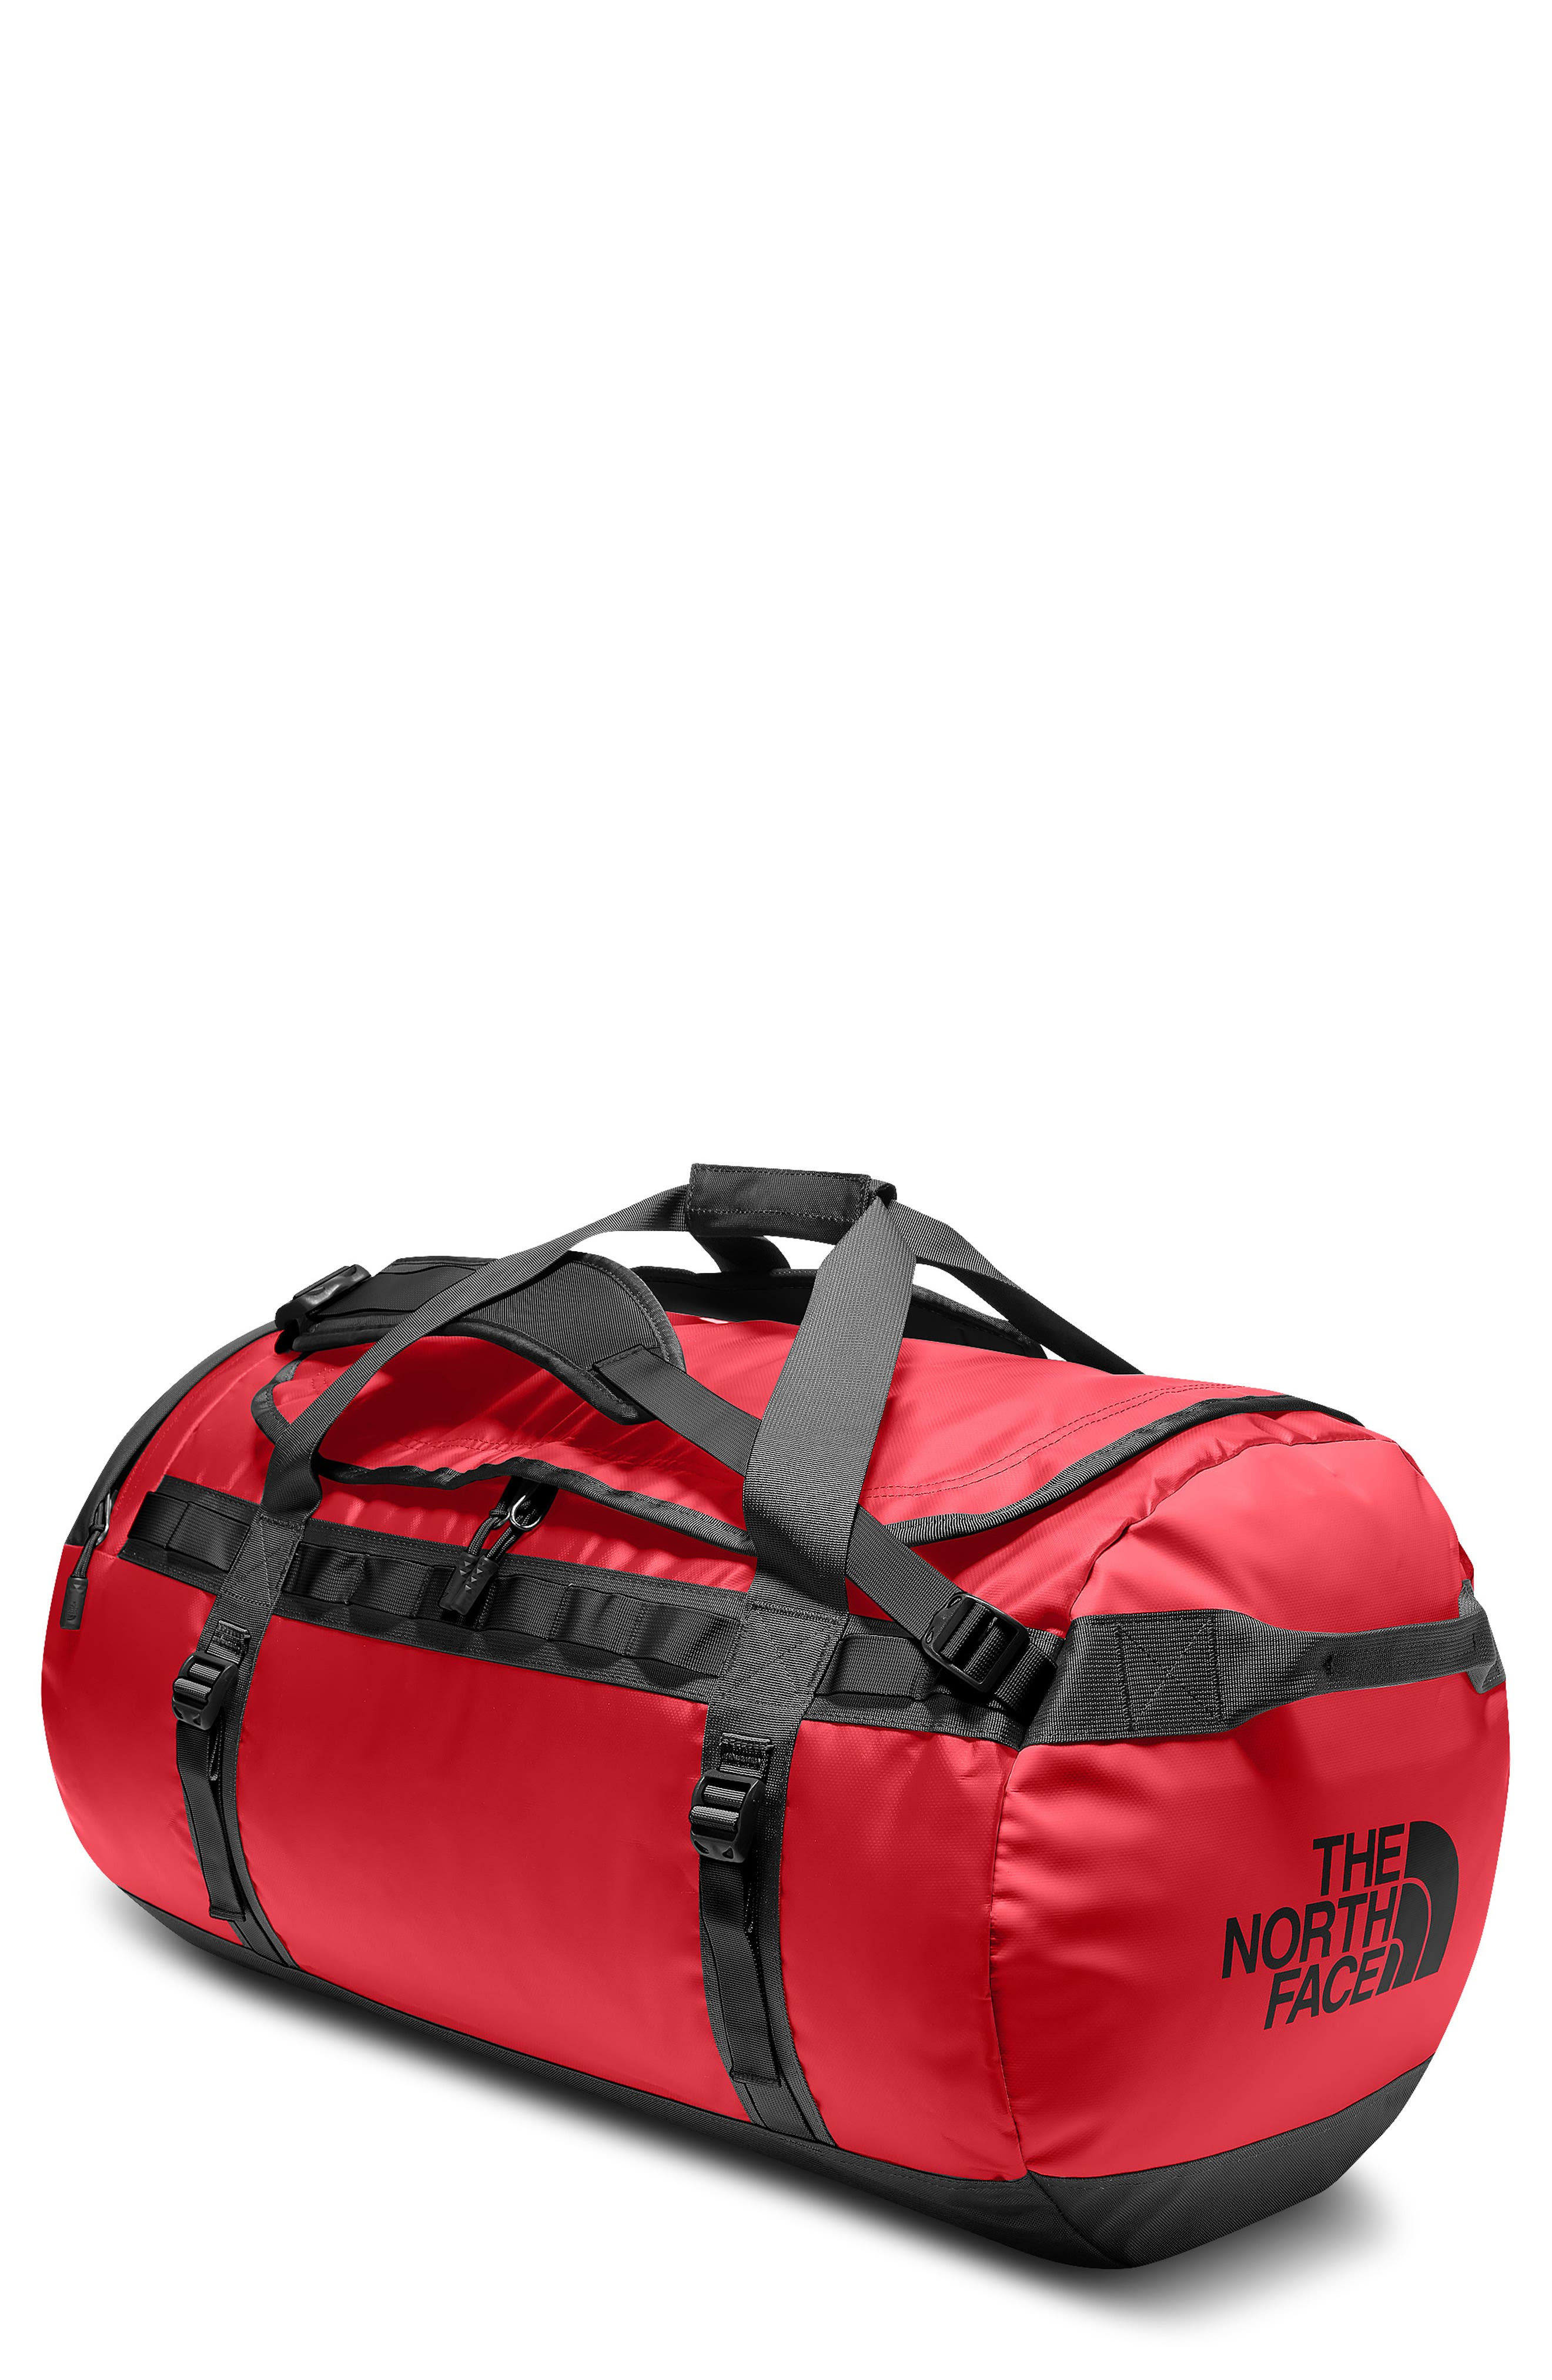 Base Camp Large Duffel Bag,                         Main,                         color, Red/ Black